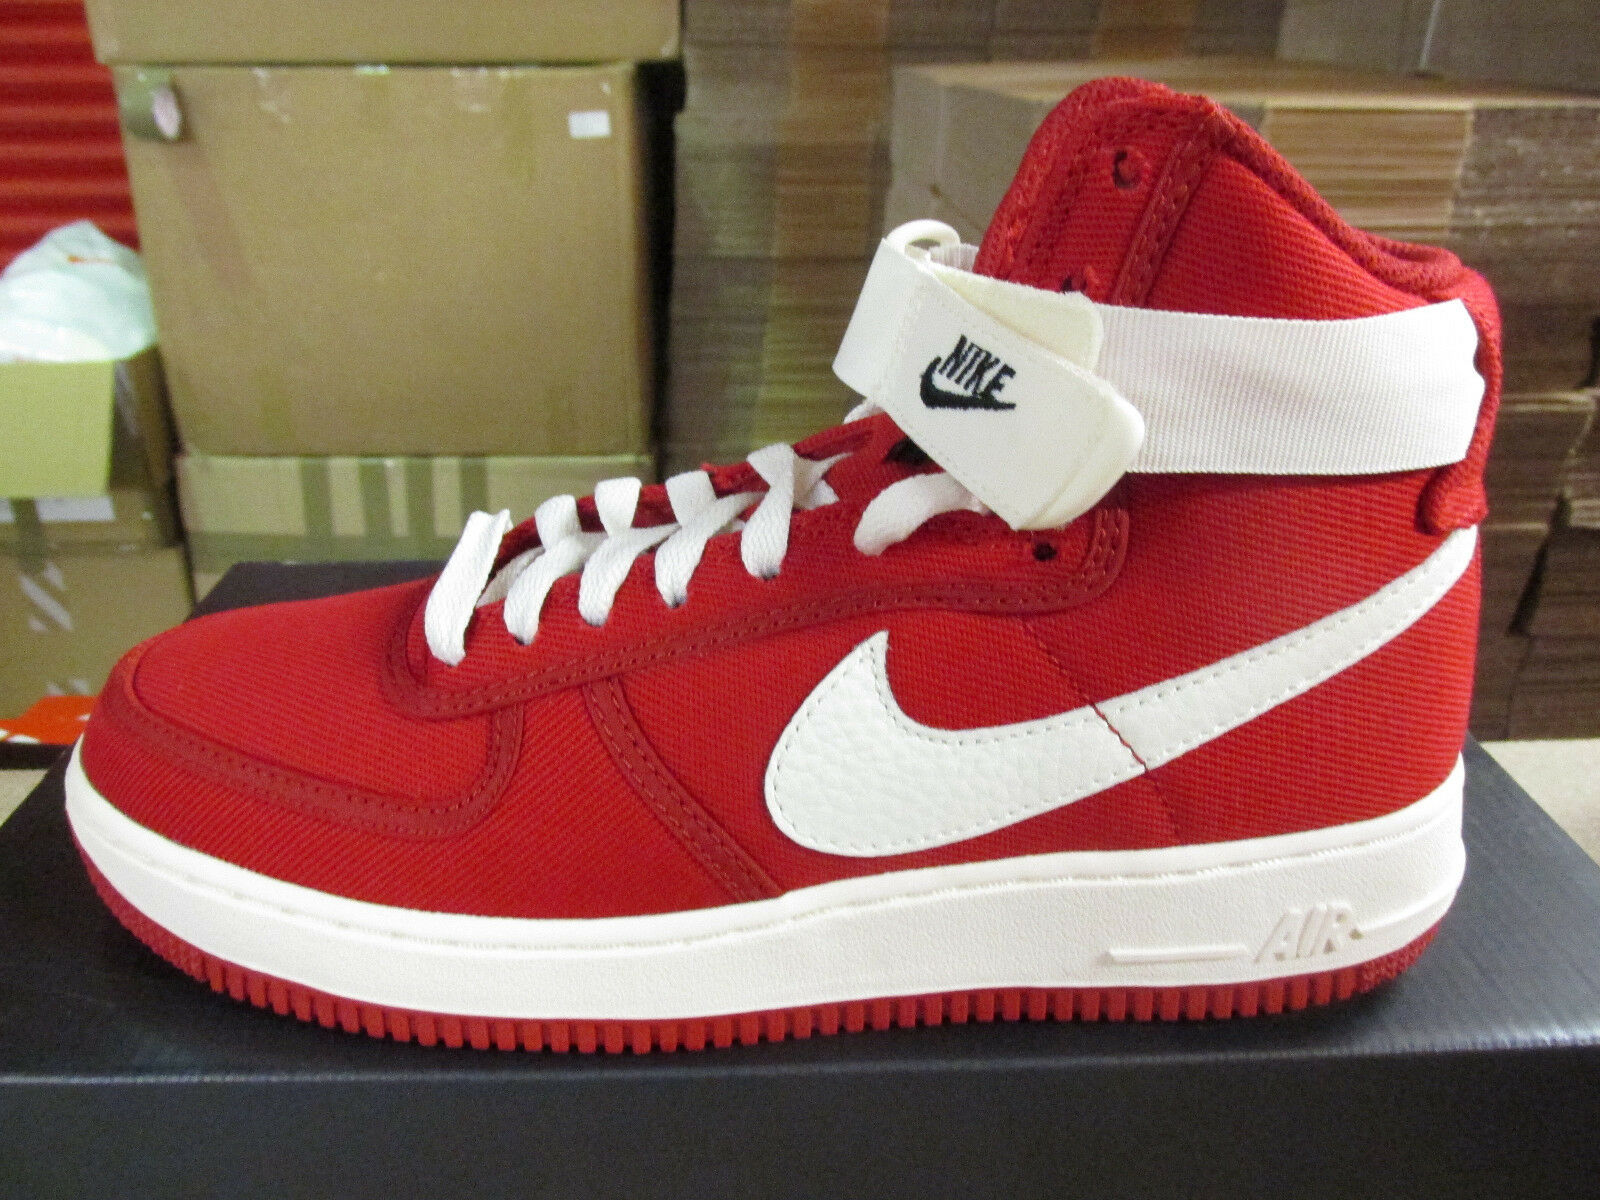 Nike Air Force 1 High Retro Uomo Hi Top Trainers 832747 600  Shoes